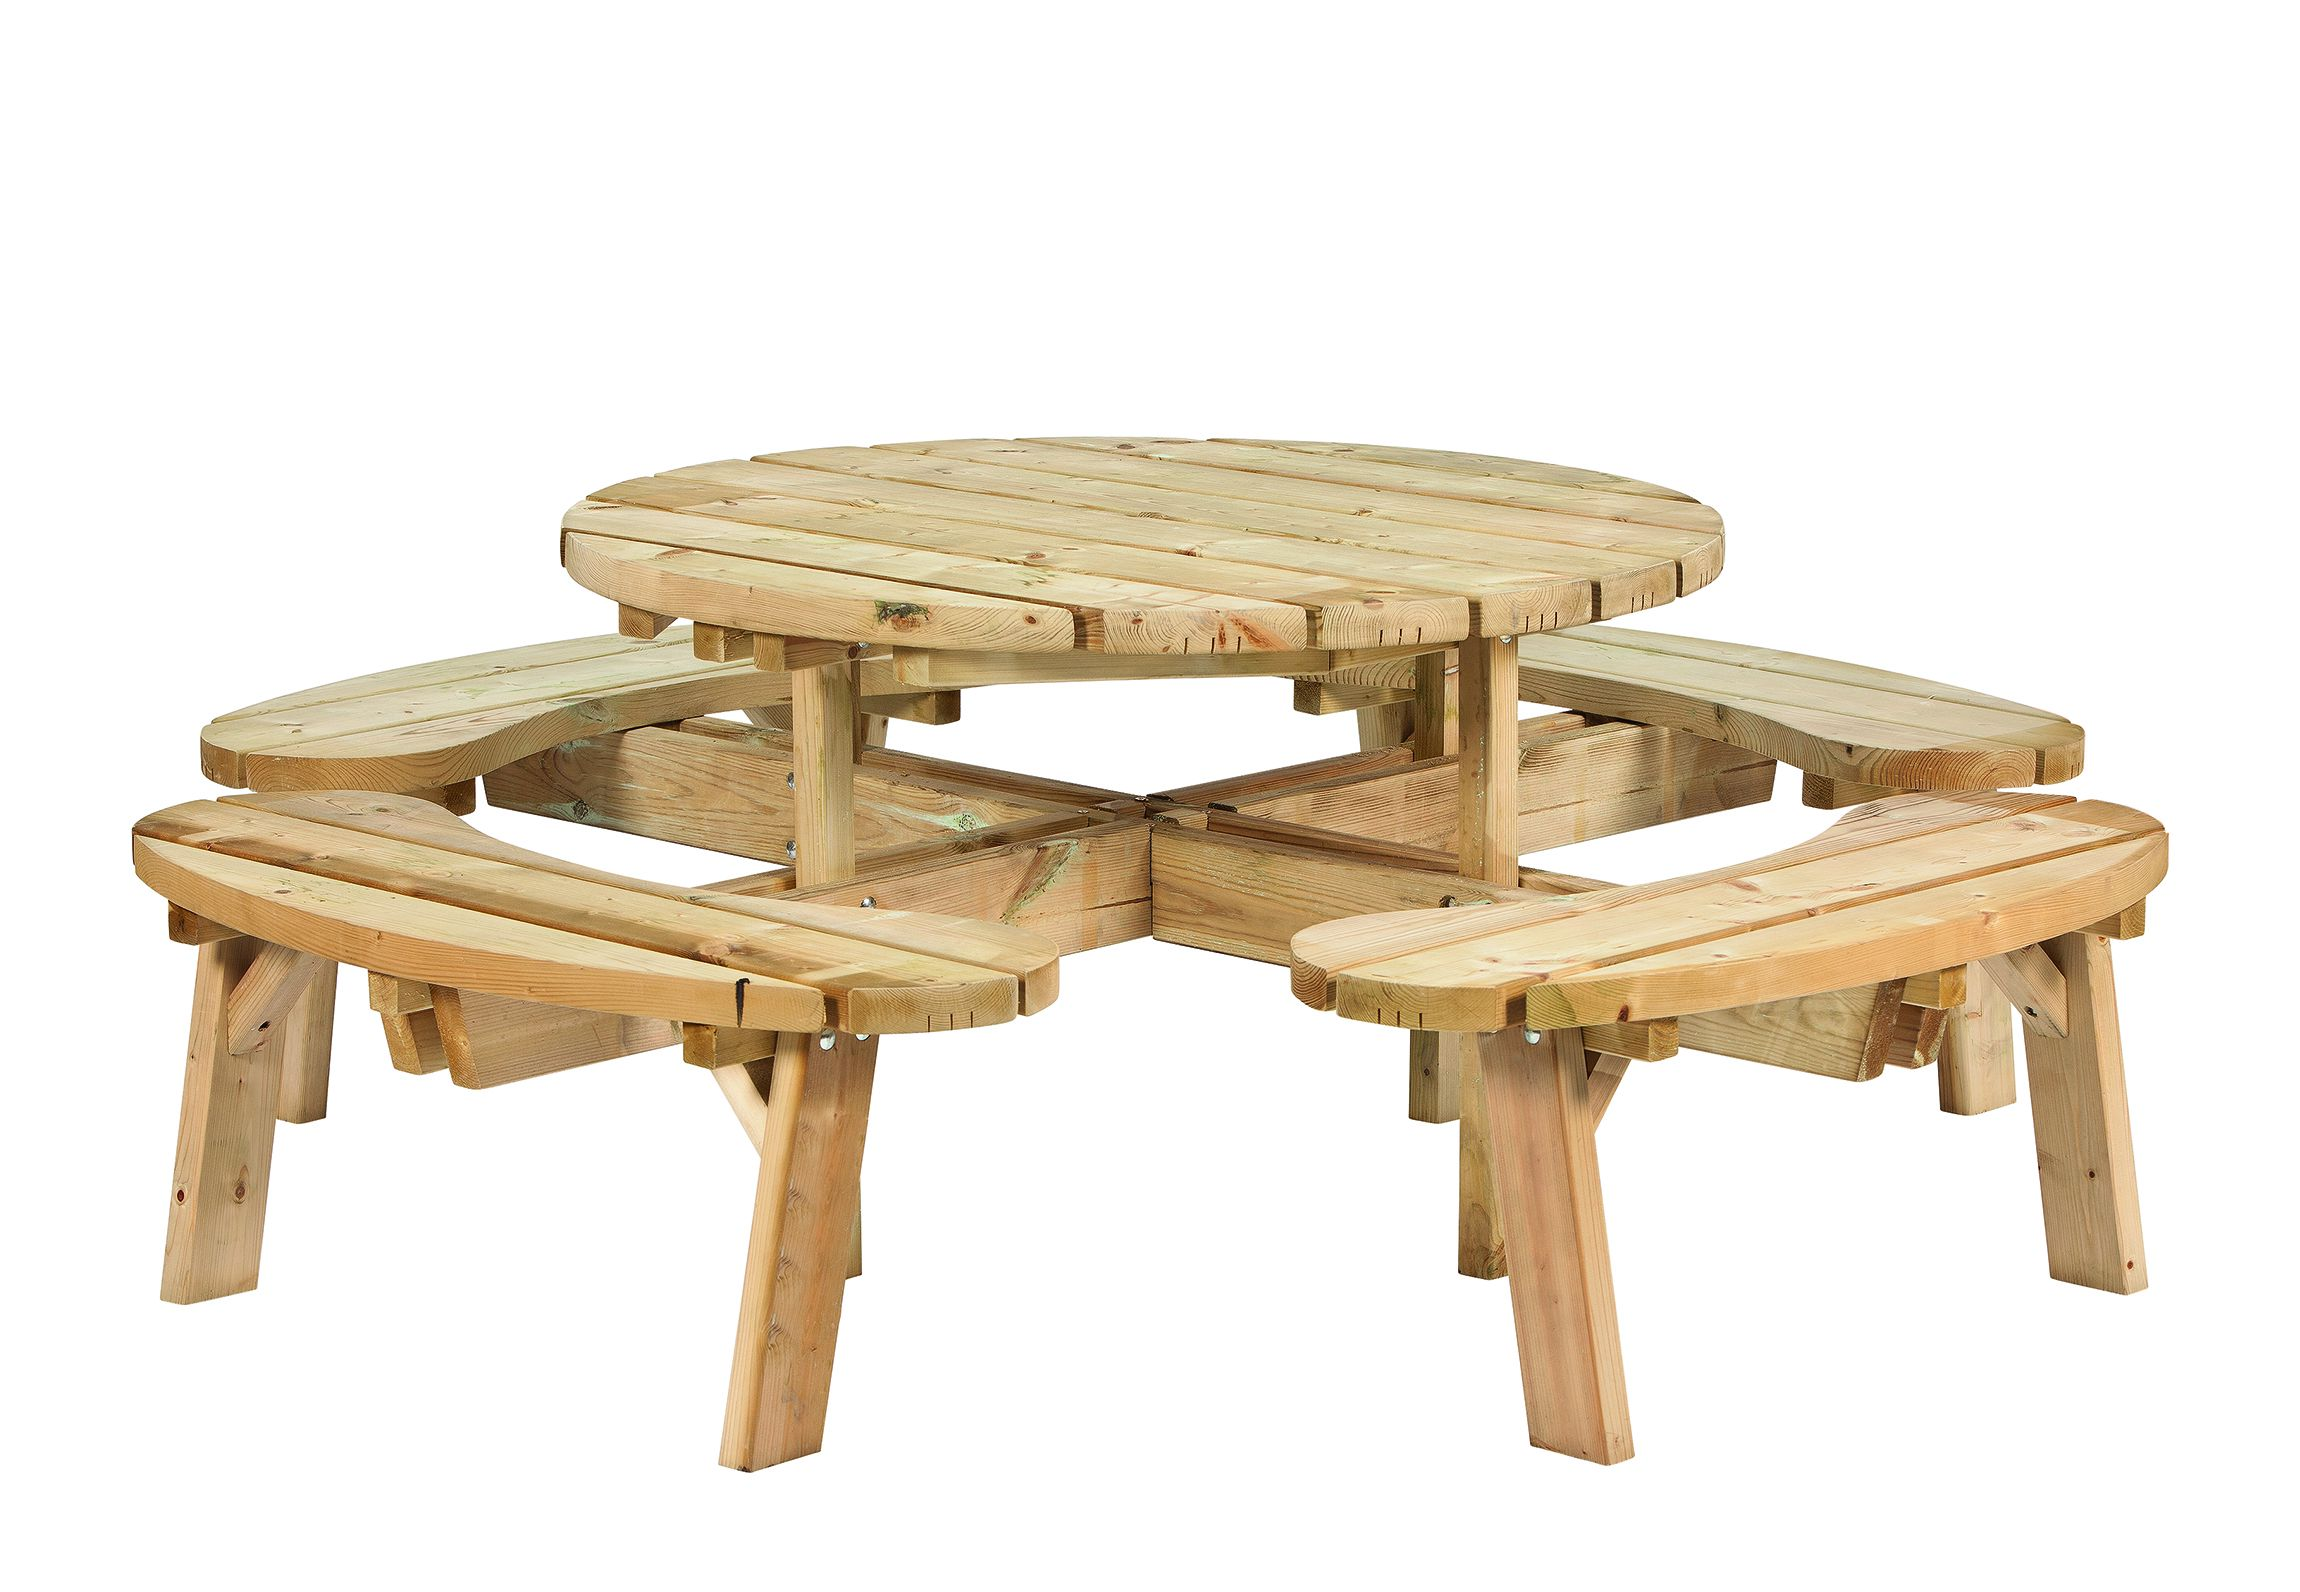 Ronde Houten Picknicktafel.Picknicktafel Rond 219 X 73 Cm Houten Picknick Tafel